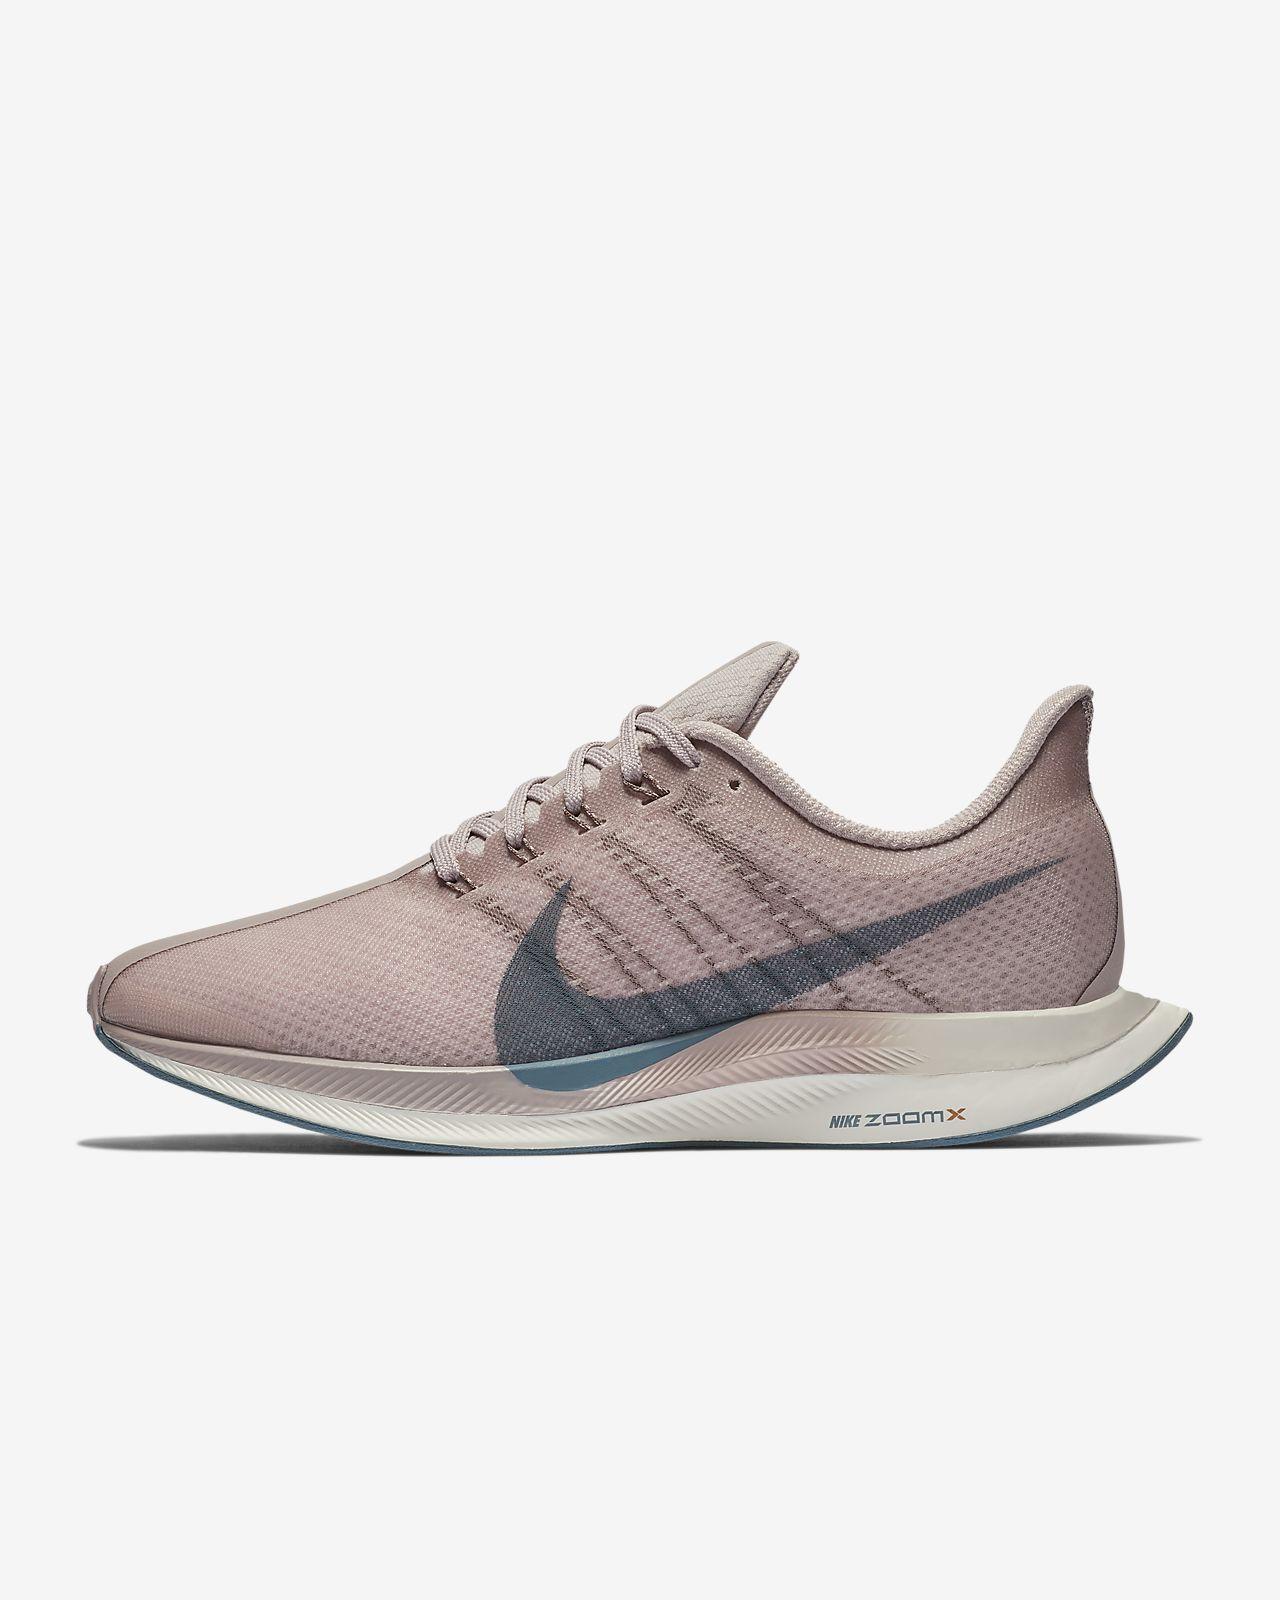 7e37823806b Nike Zoom Pegasus Turbo Women s Running Shoe. Nike.com LU